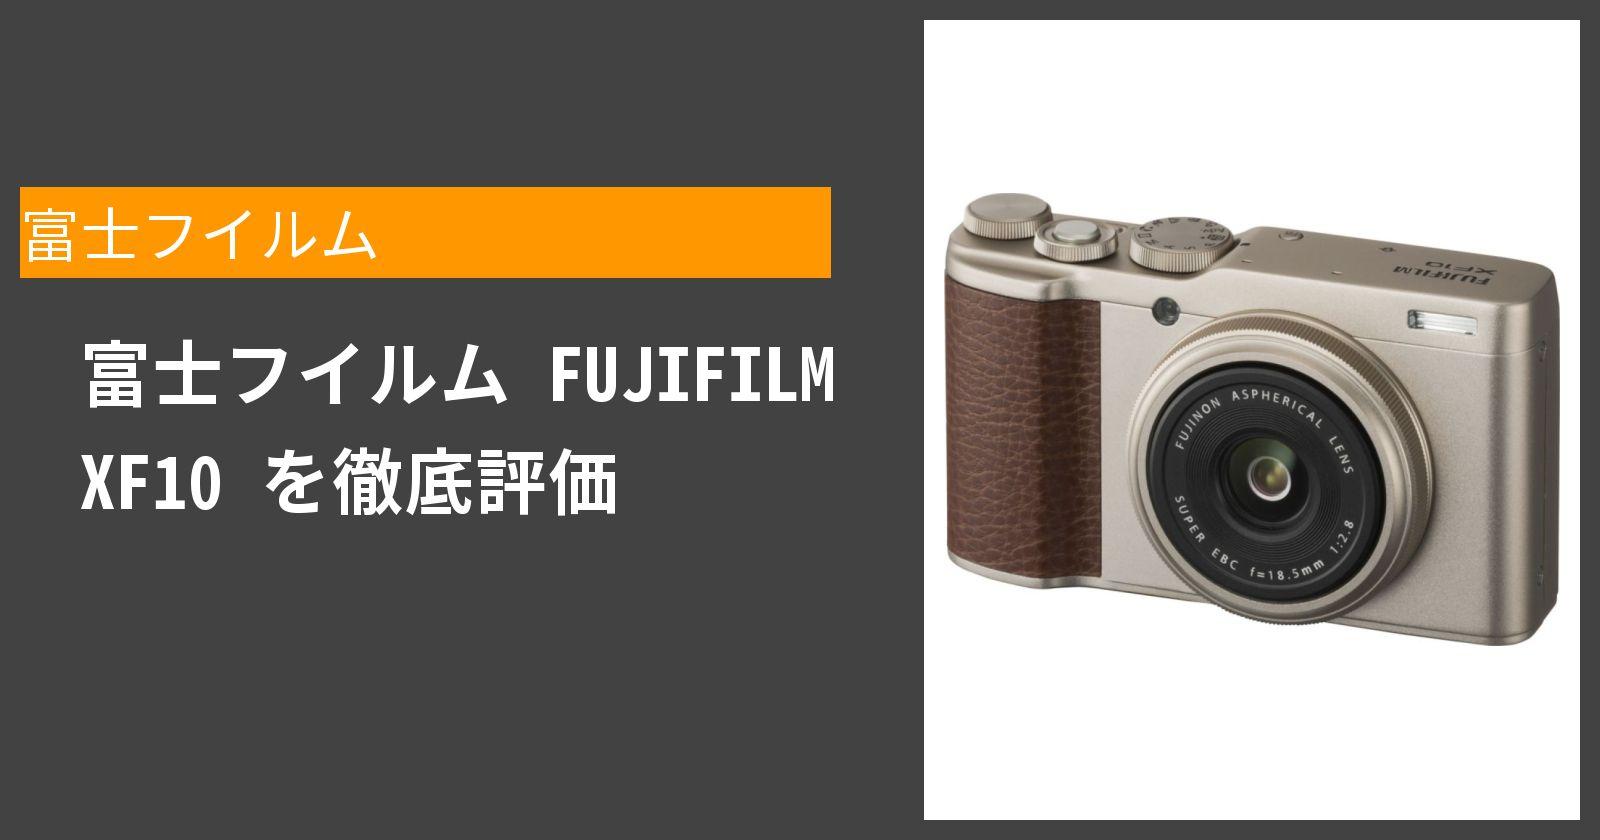 FUJIFILM XF10を徹底評価